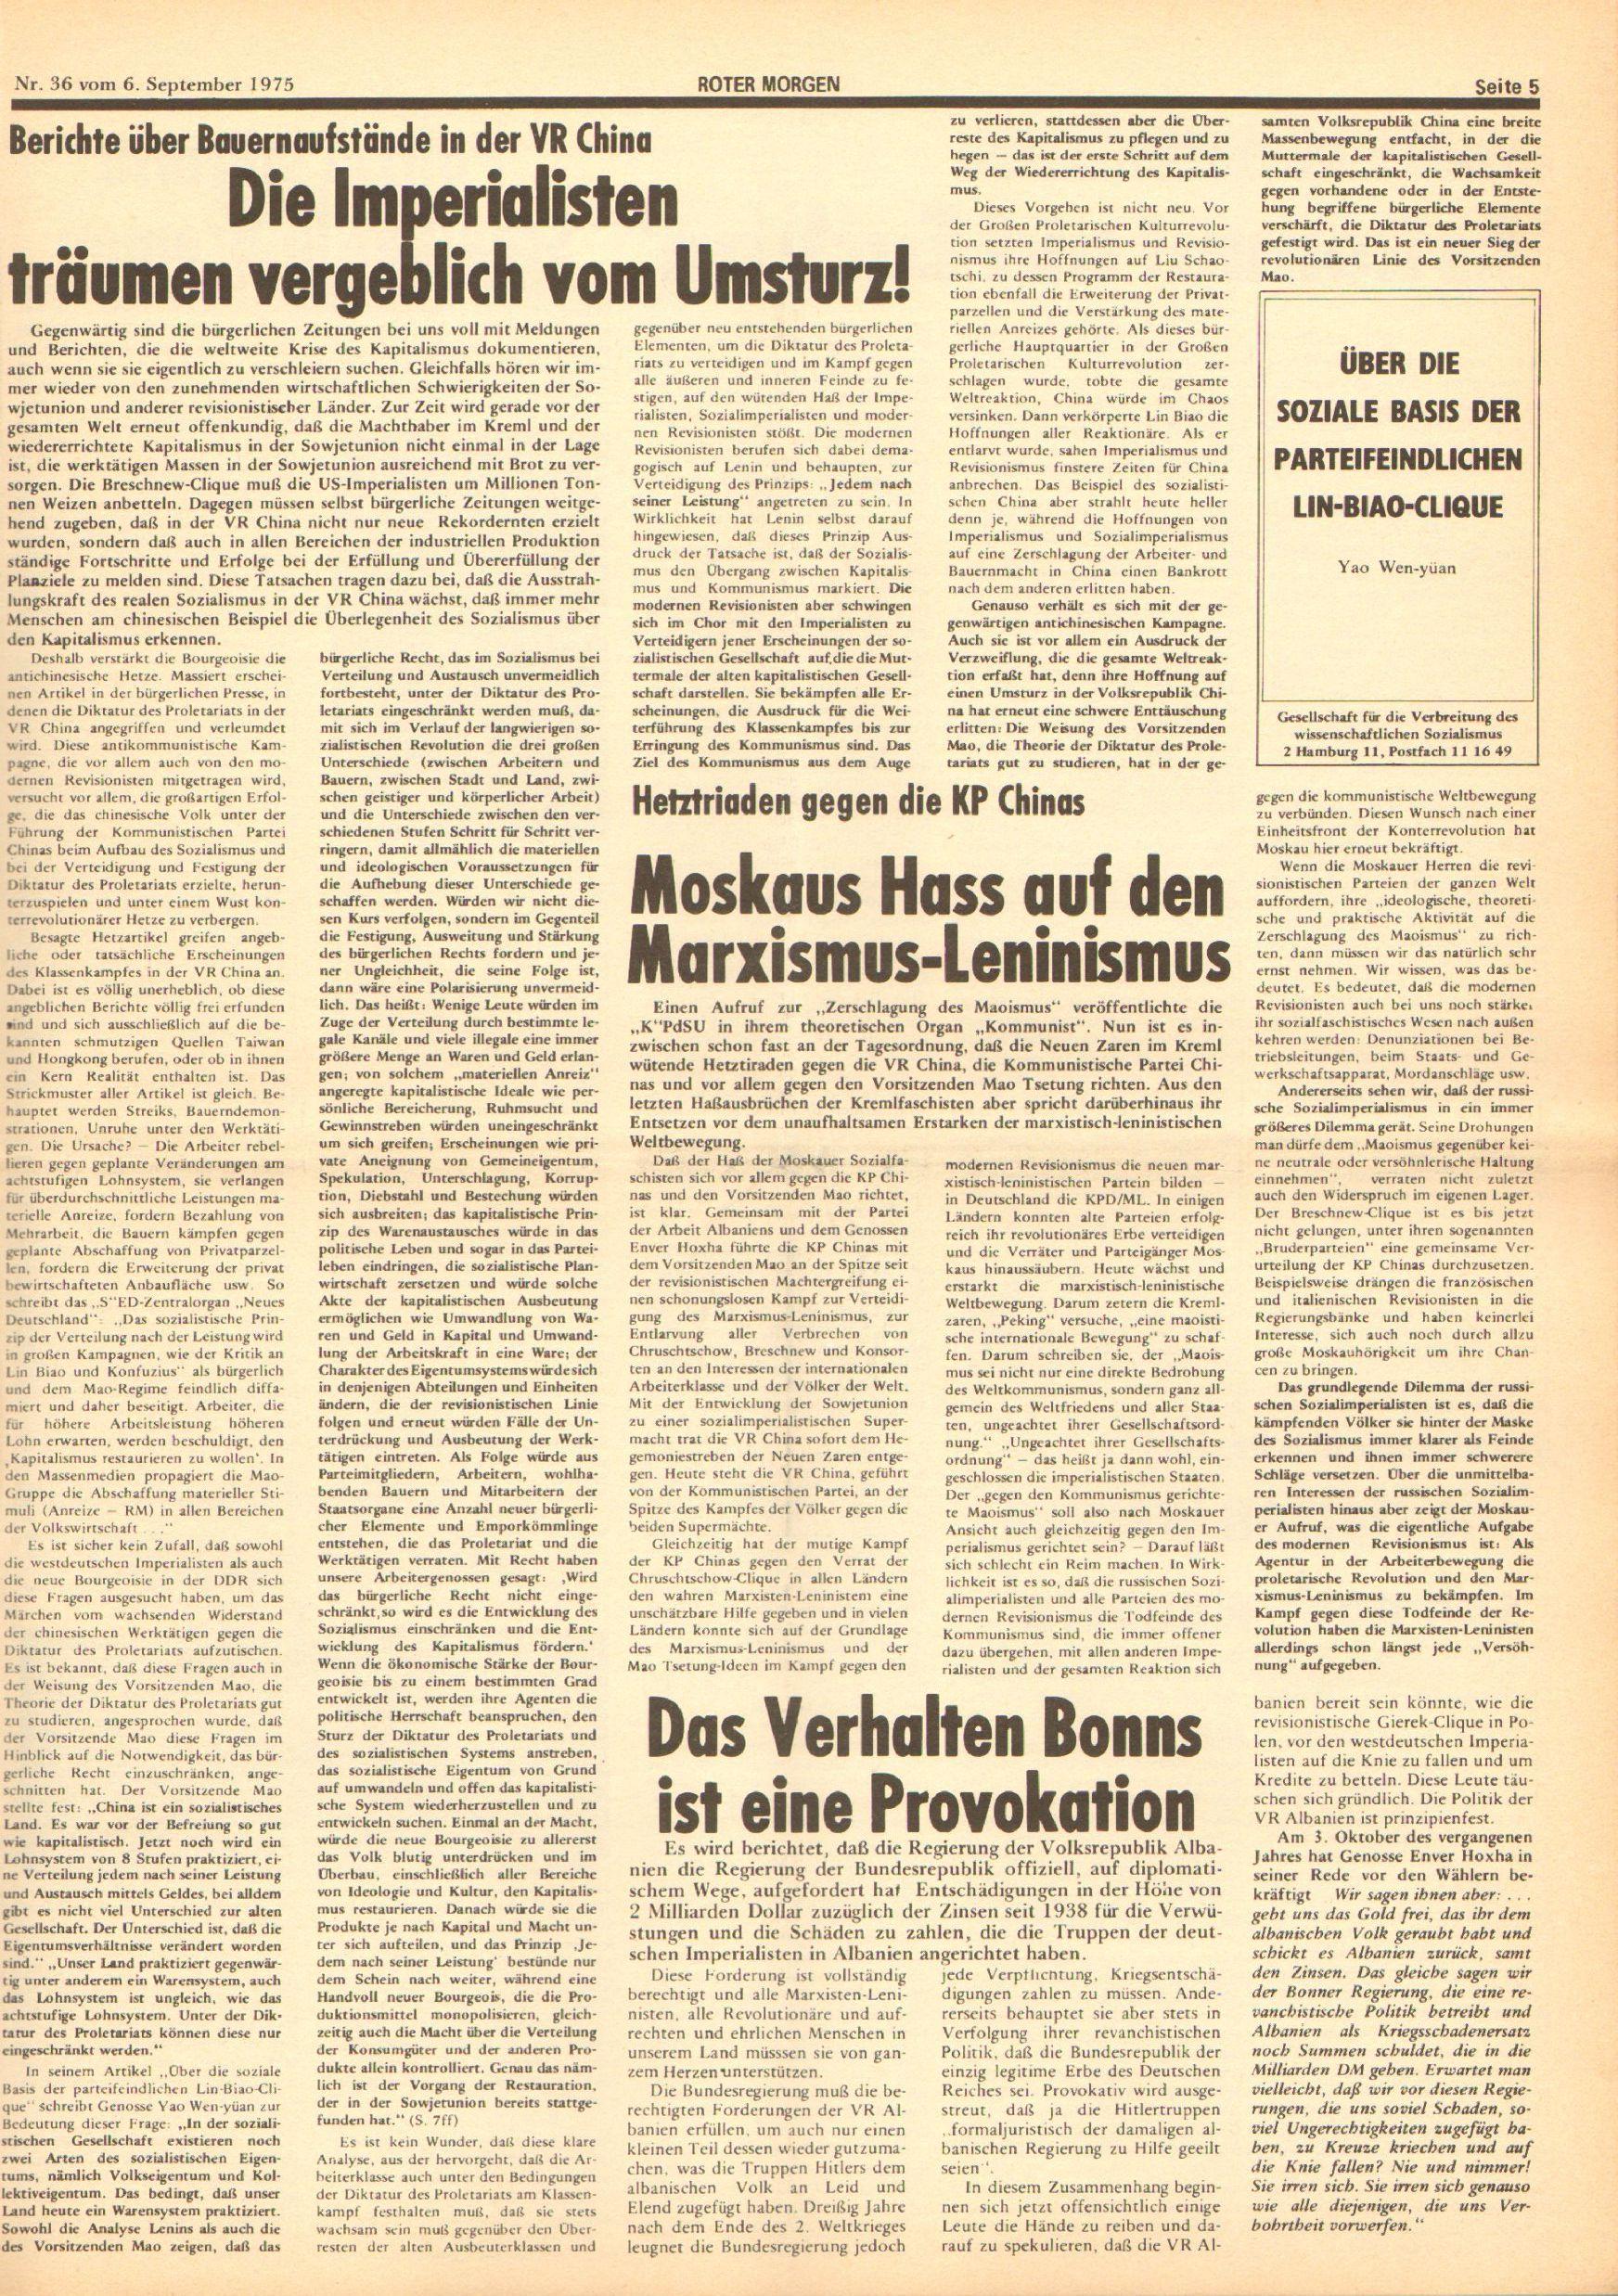 Roter Morgen, 9. Jg., 6. September 1975, Nr. 36, Seite 5